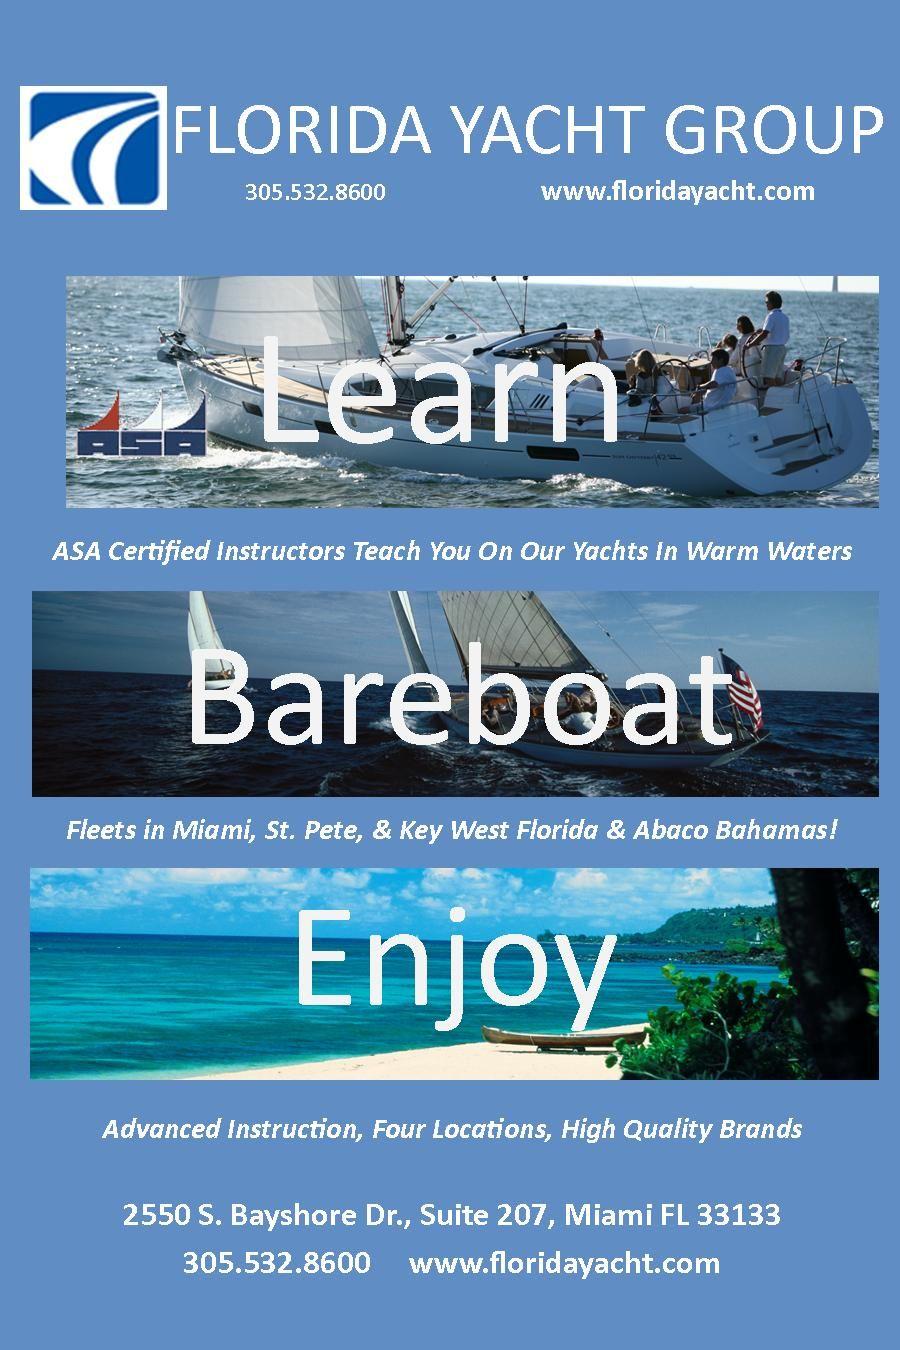 Florida Yacht Offeres Asa Courses Year Round Asa Sailing School